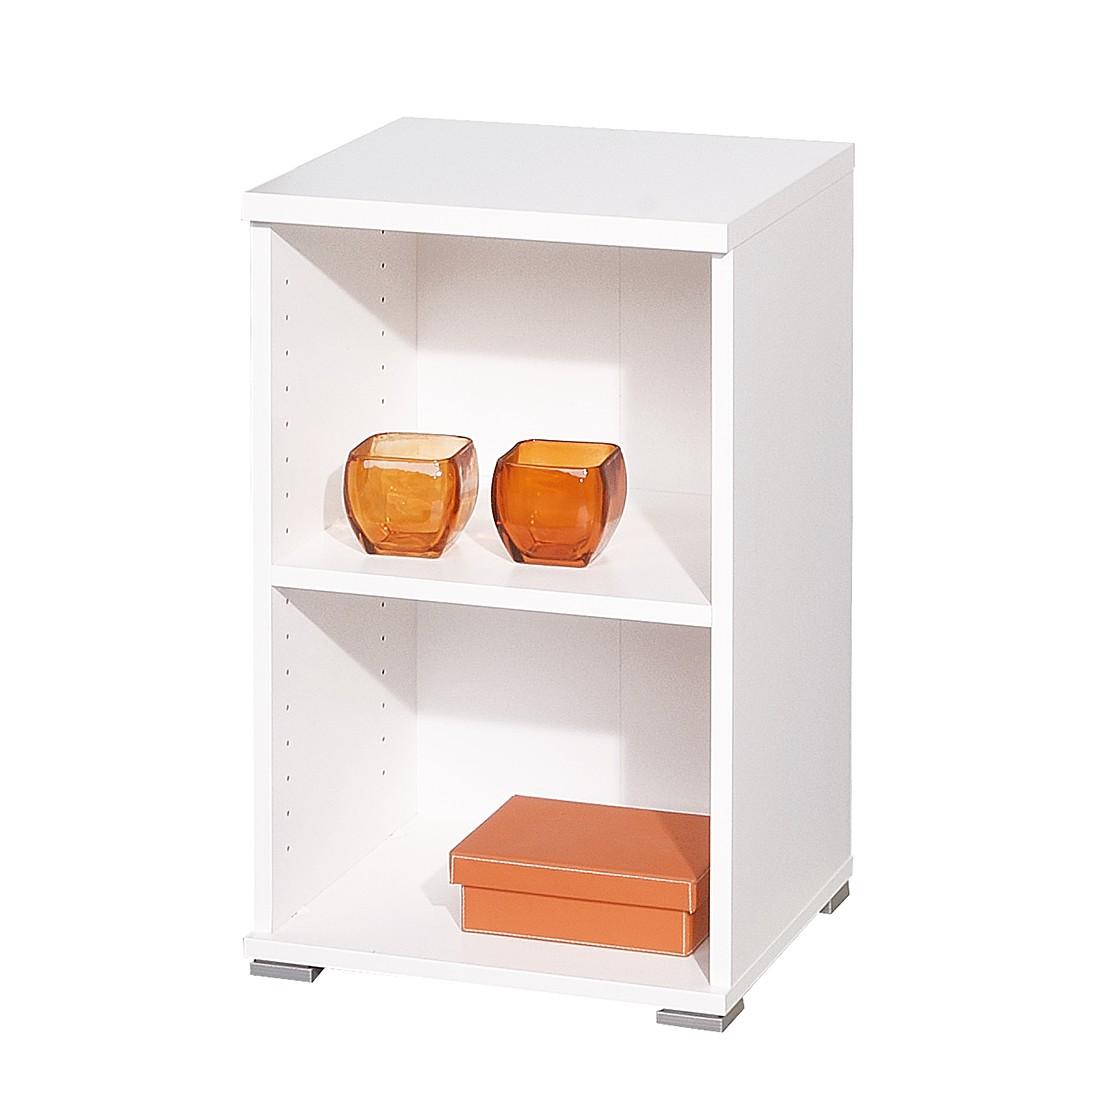 beistellregal rio art iii wei raumteiler b cherregal standregal wandregal ebay. Black Bedroom Furniture Sets. Home Design Ideas